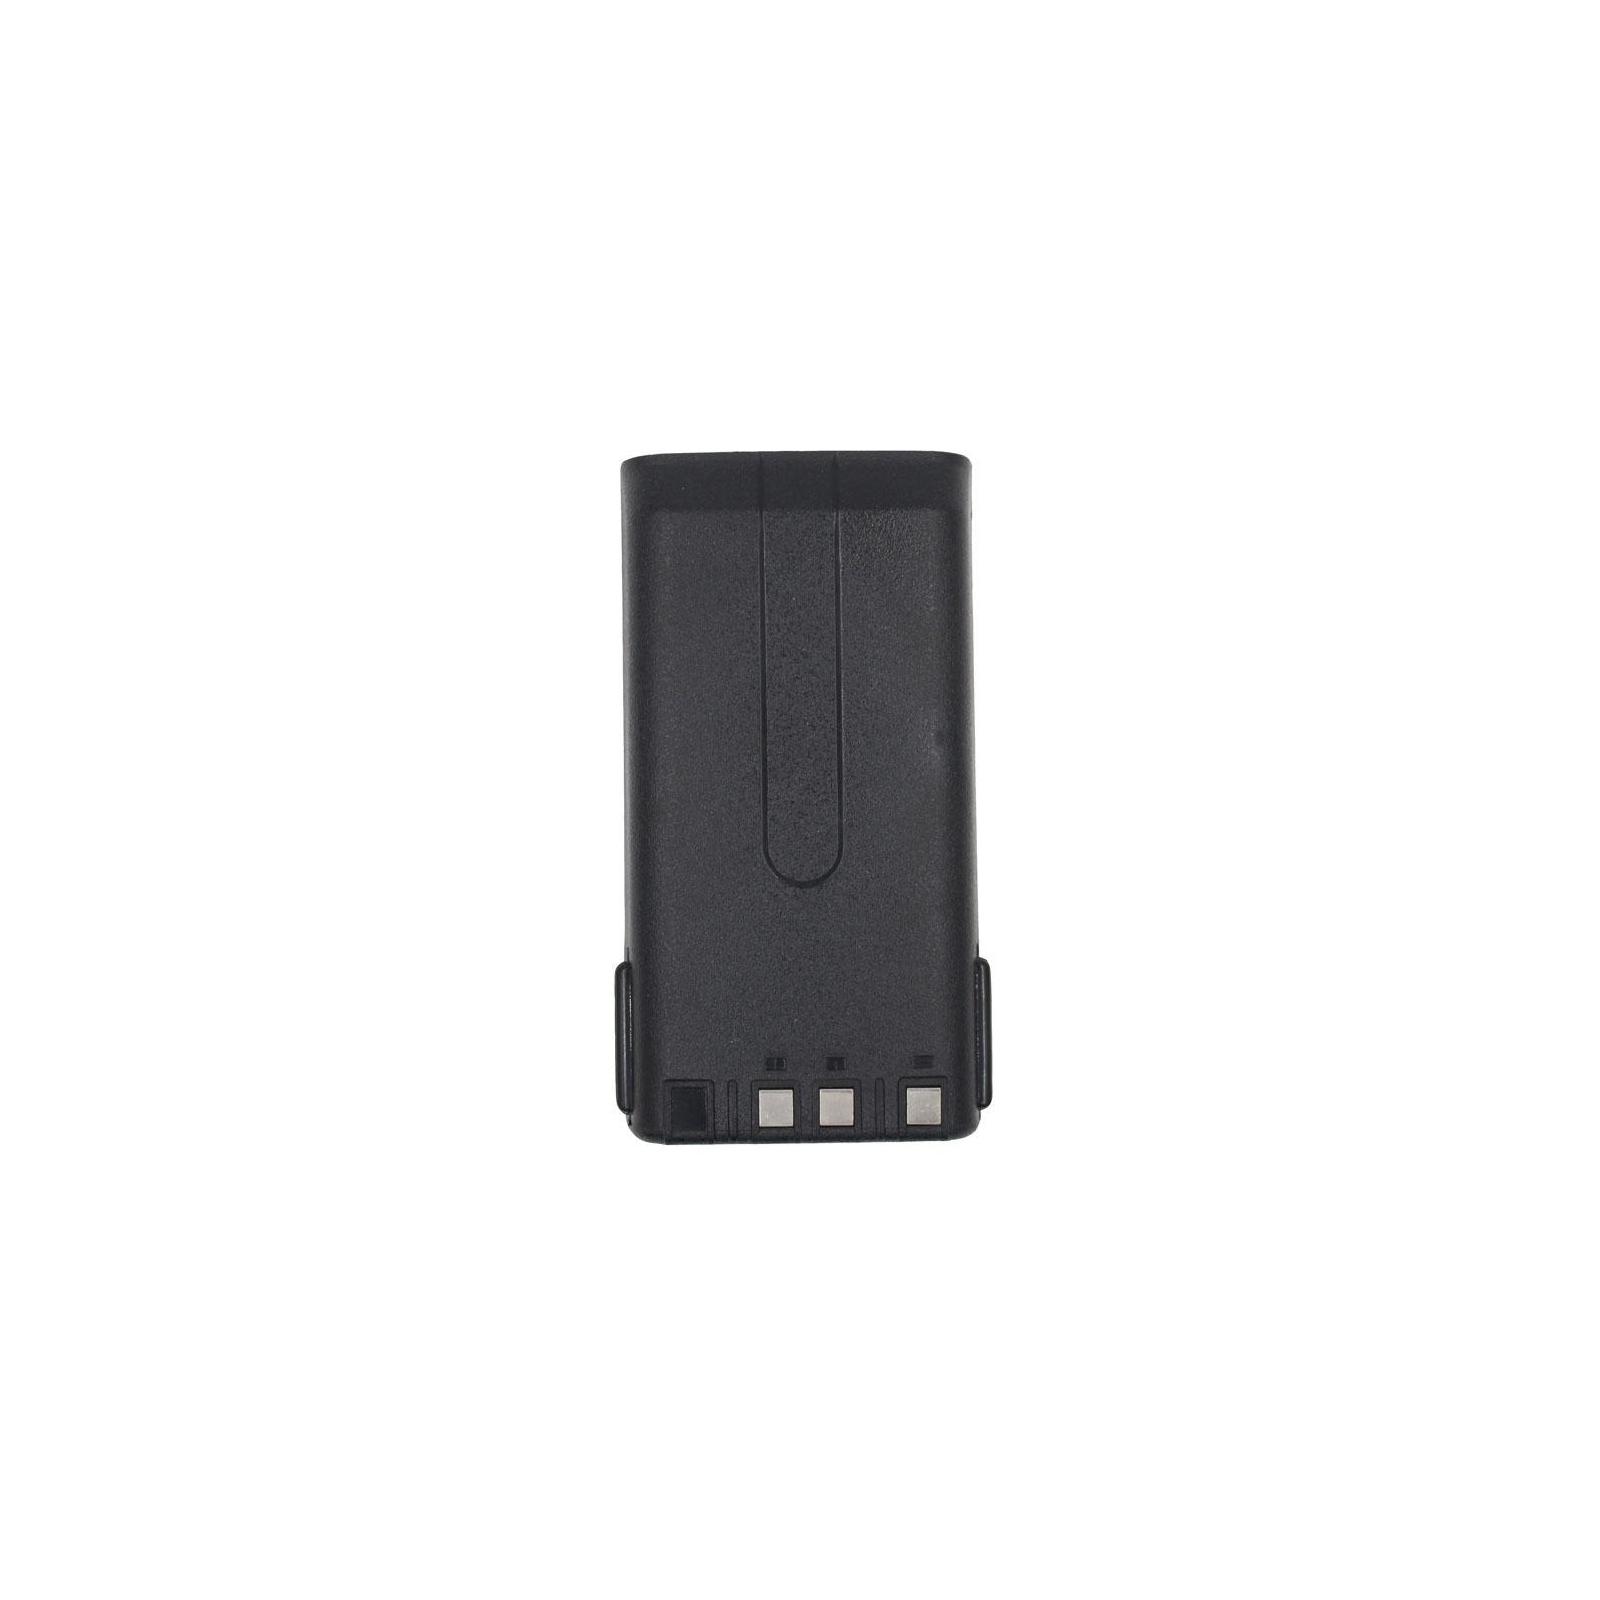 Аккумуляторная батарея для телефона Agent эквивалент акумулятора KNB-15 для Kenwood 1100mAh NiCd (PTK-15) изображение 2